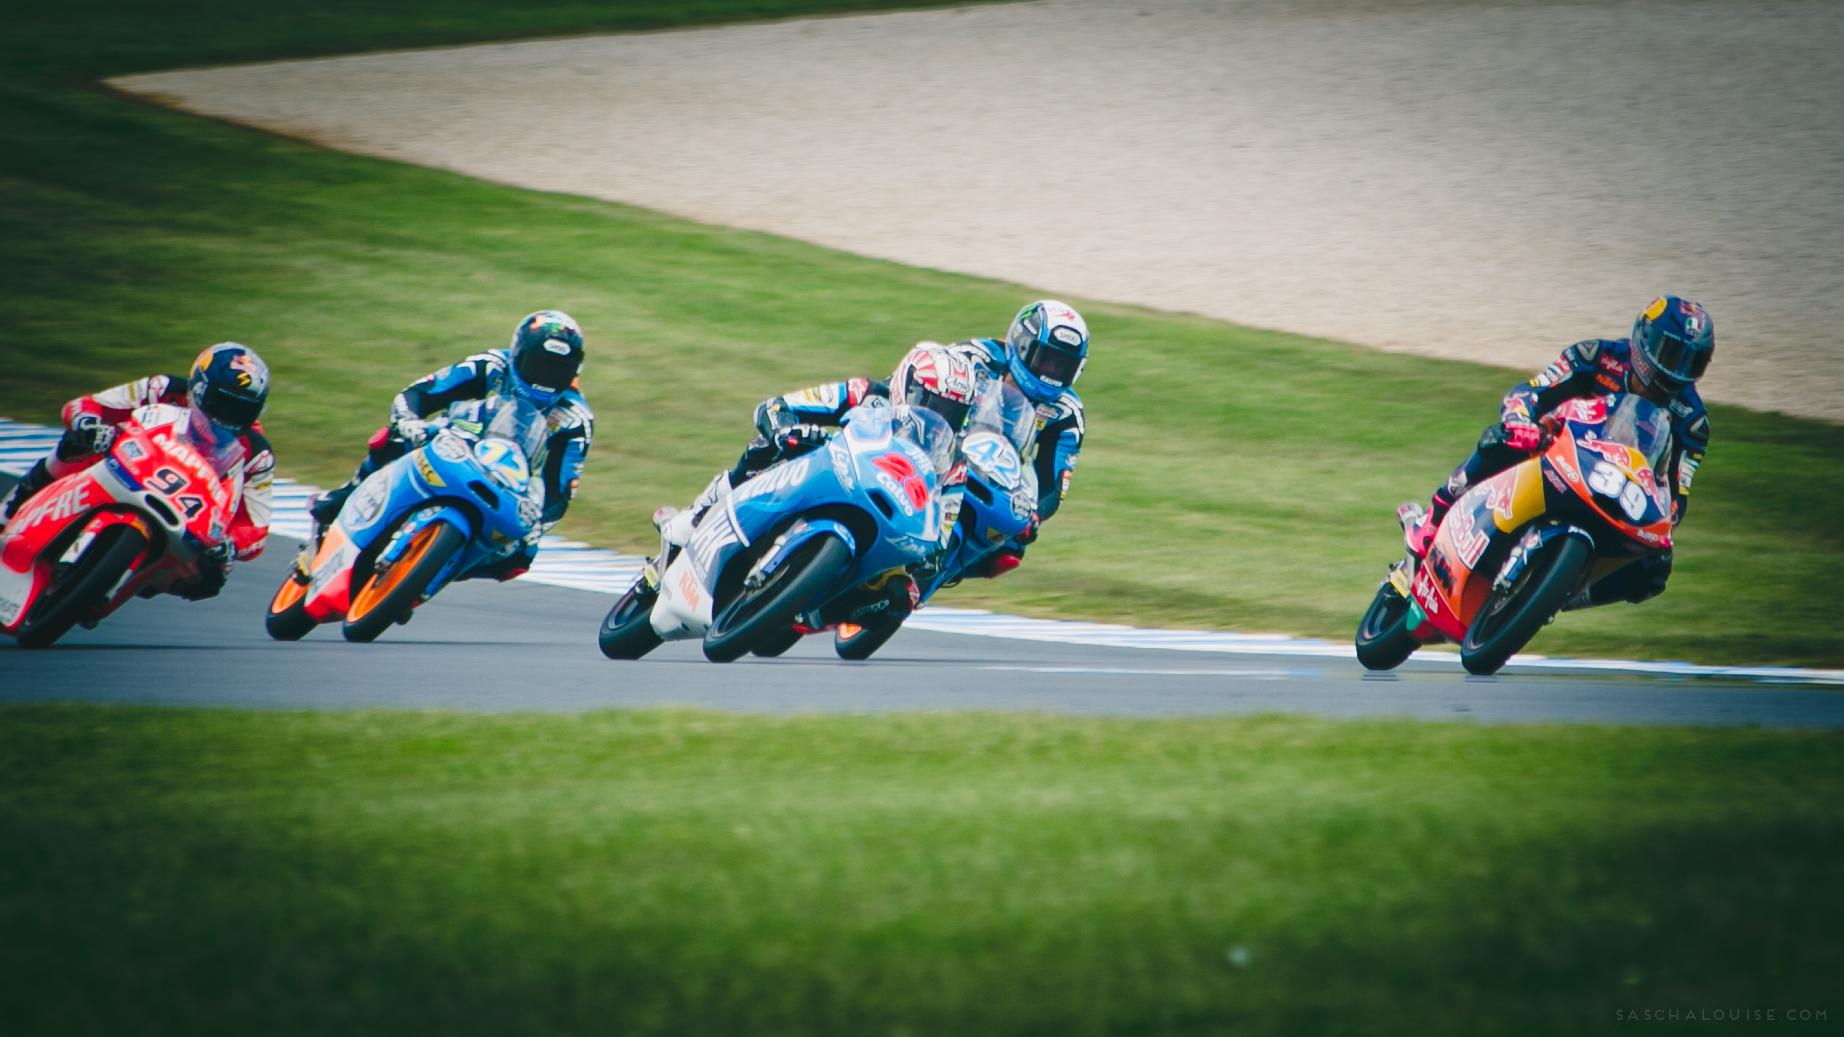 saschalouise.com_MotoGP2013-2.jpg